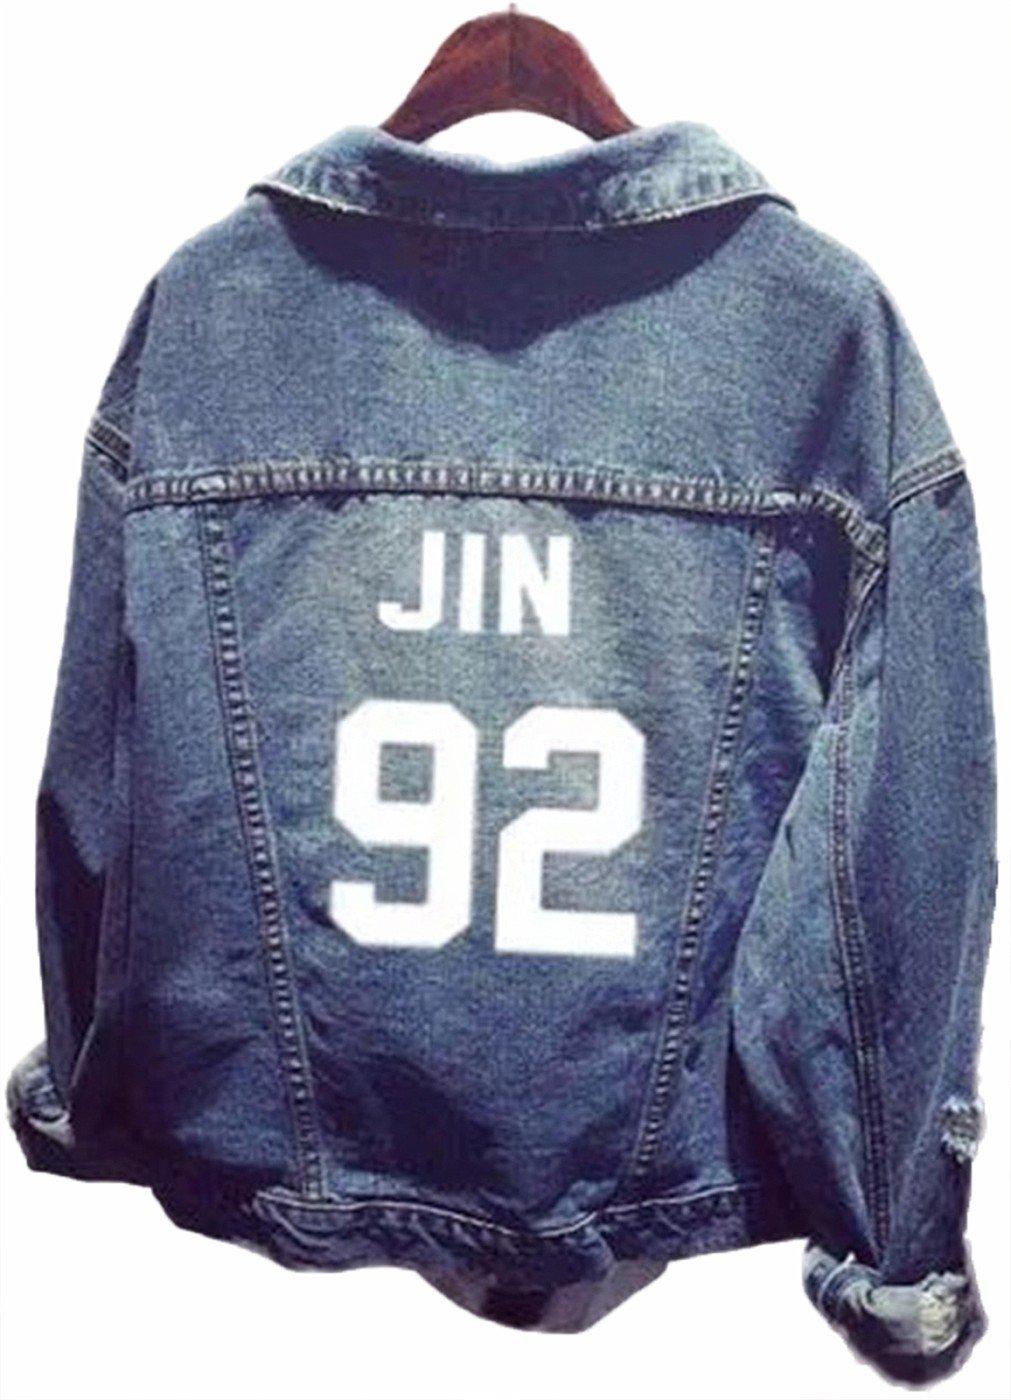 SERAPHY Unisex Music Group Jacket Chaqueta Jeans Coat for Army Kpop Hoodies Suga Jin Jimin Jung Kook J-Hope Rap-Monster…